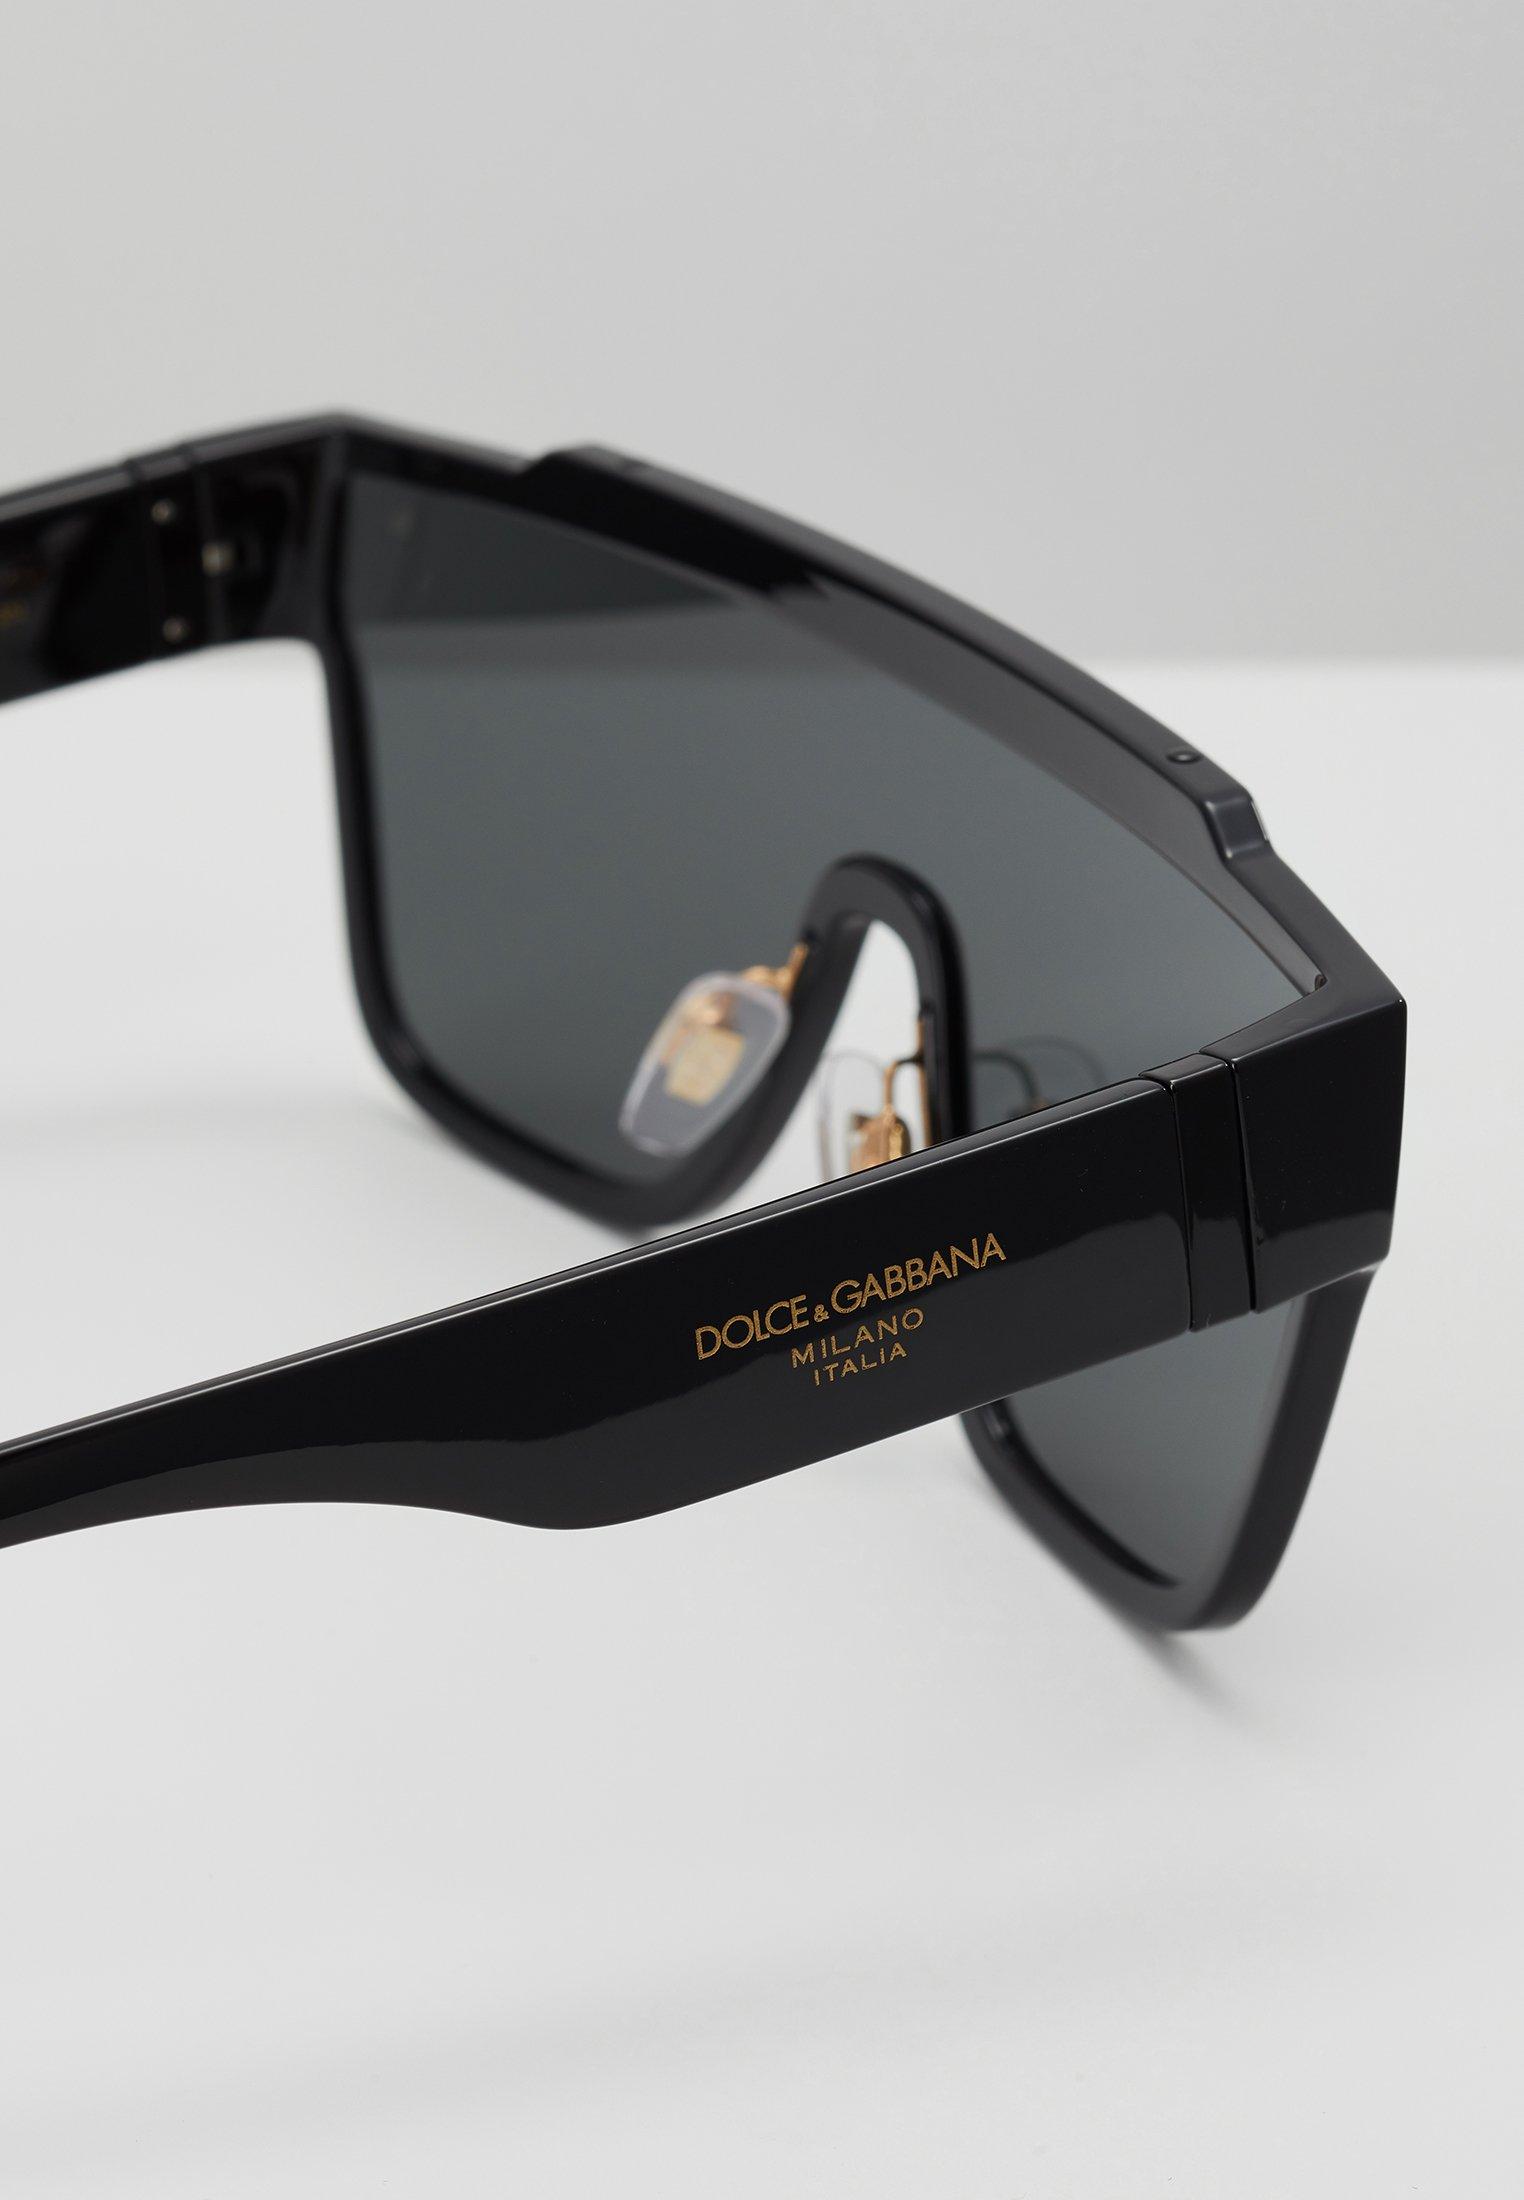 DolceGabbana Sonnenbrille - black/schwarz - Herrenaccessoires PHhJ8